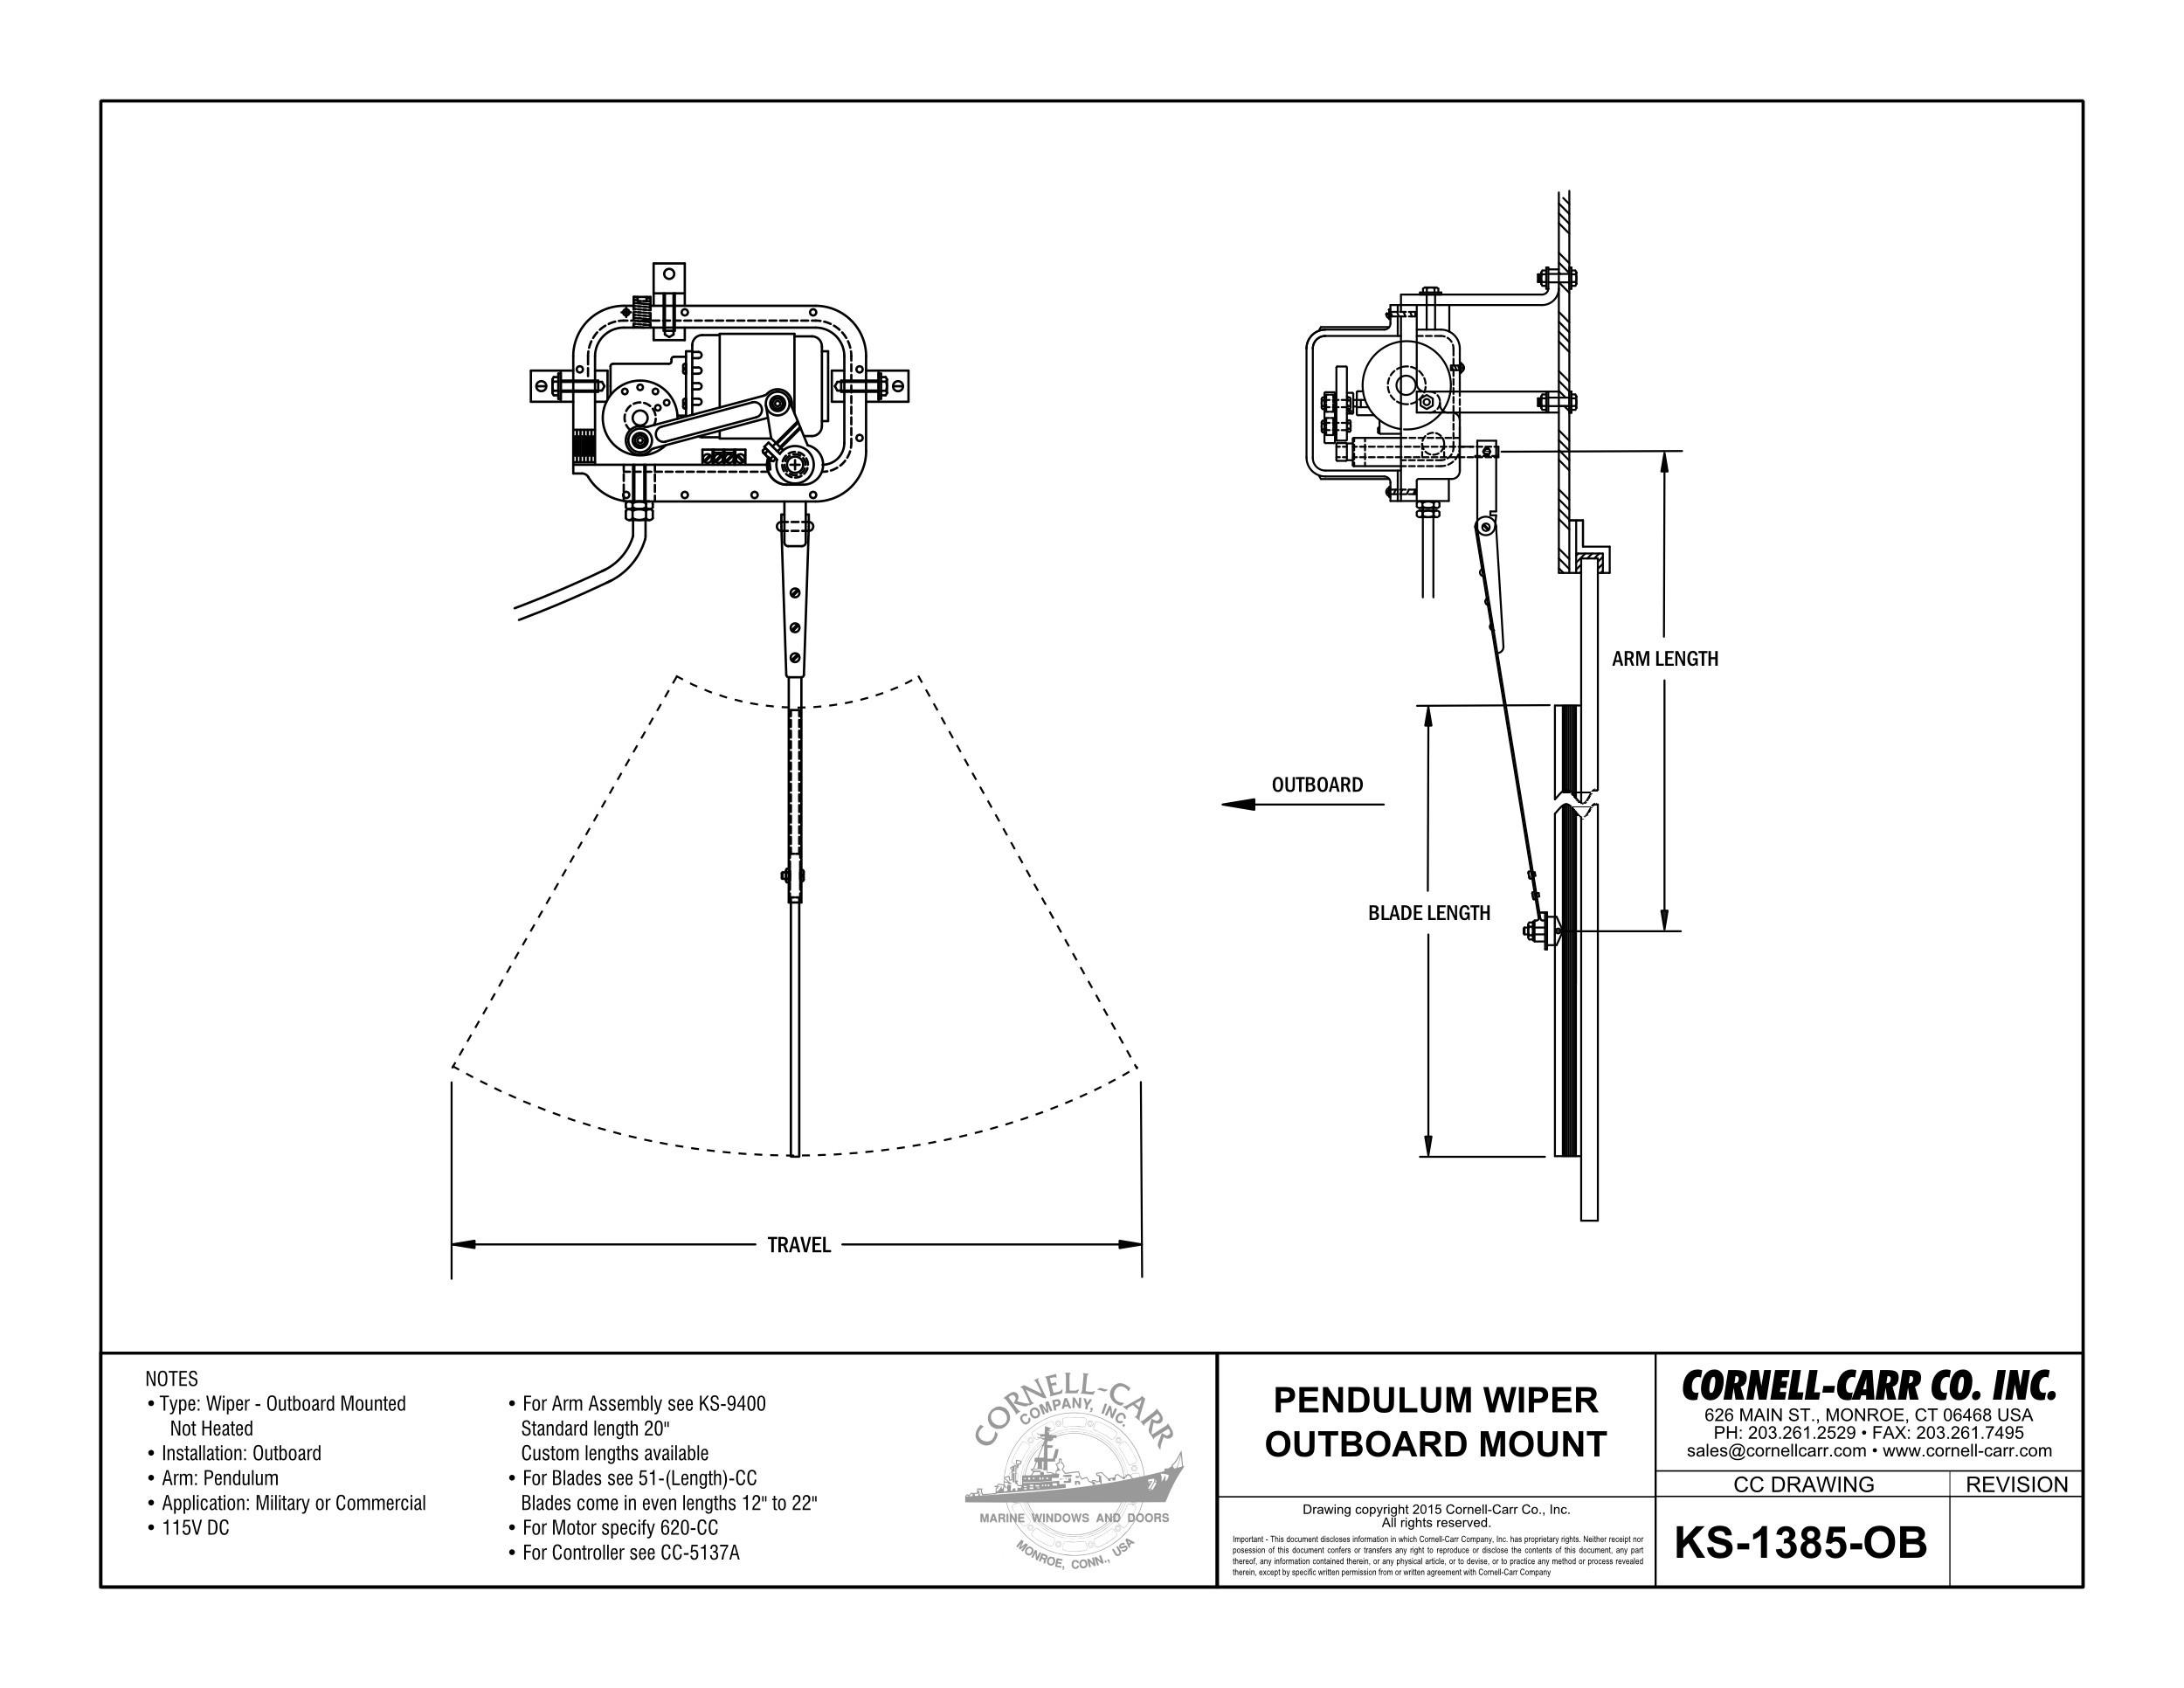 KS-1385OB Commercial Outboard Wiper, Pendulum Arm